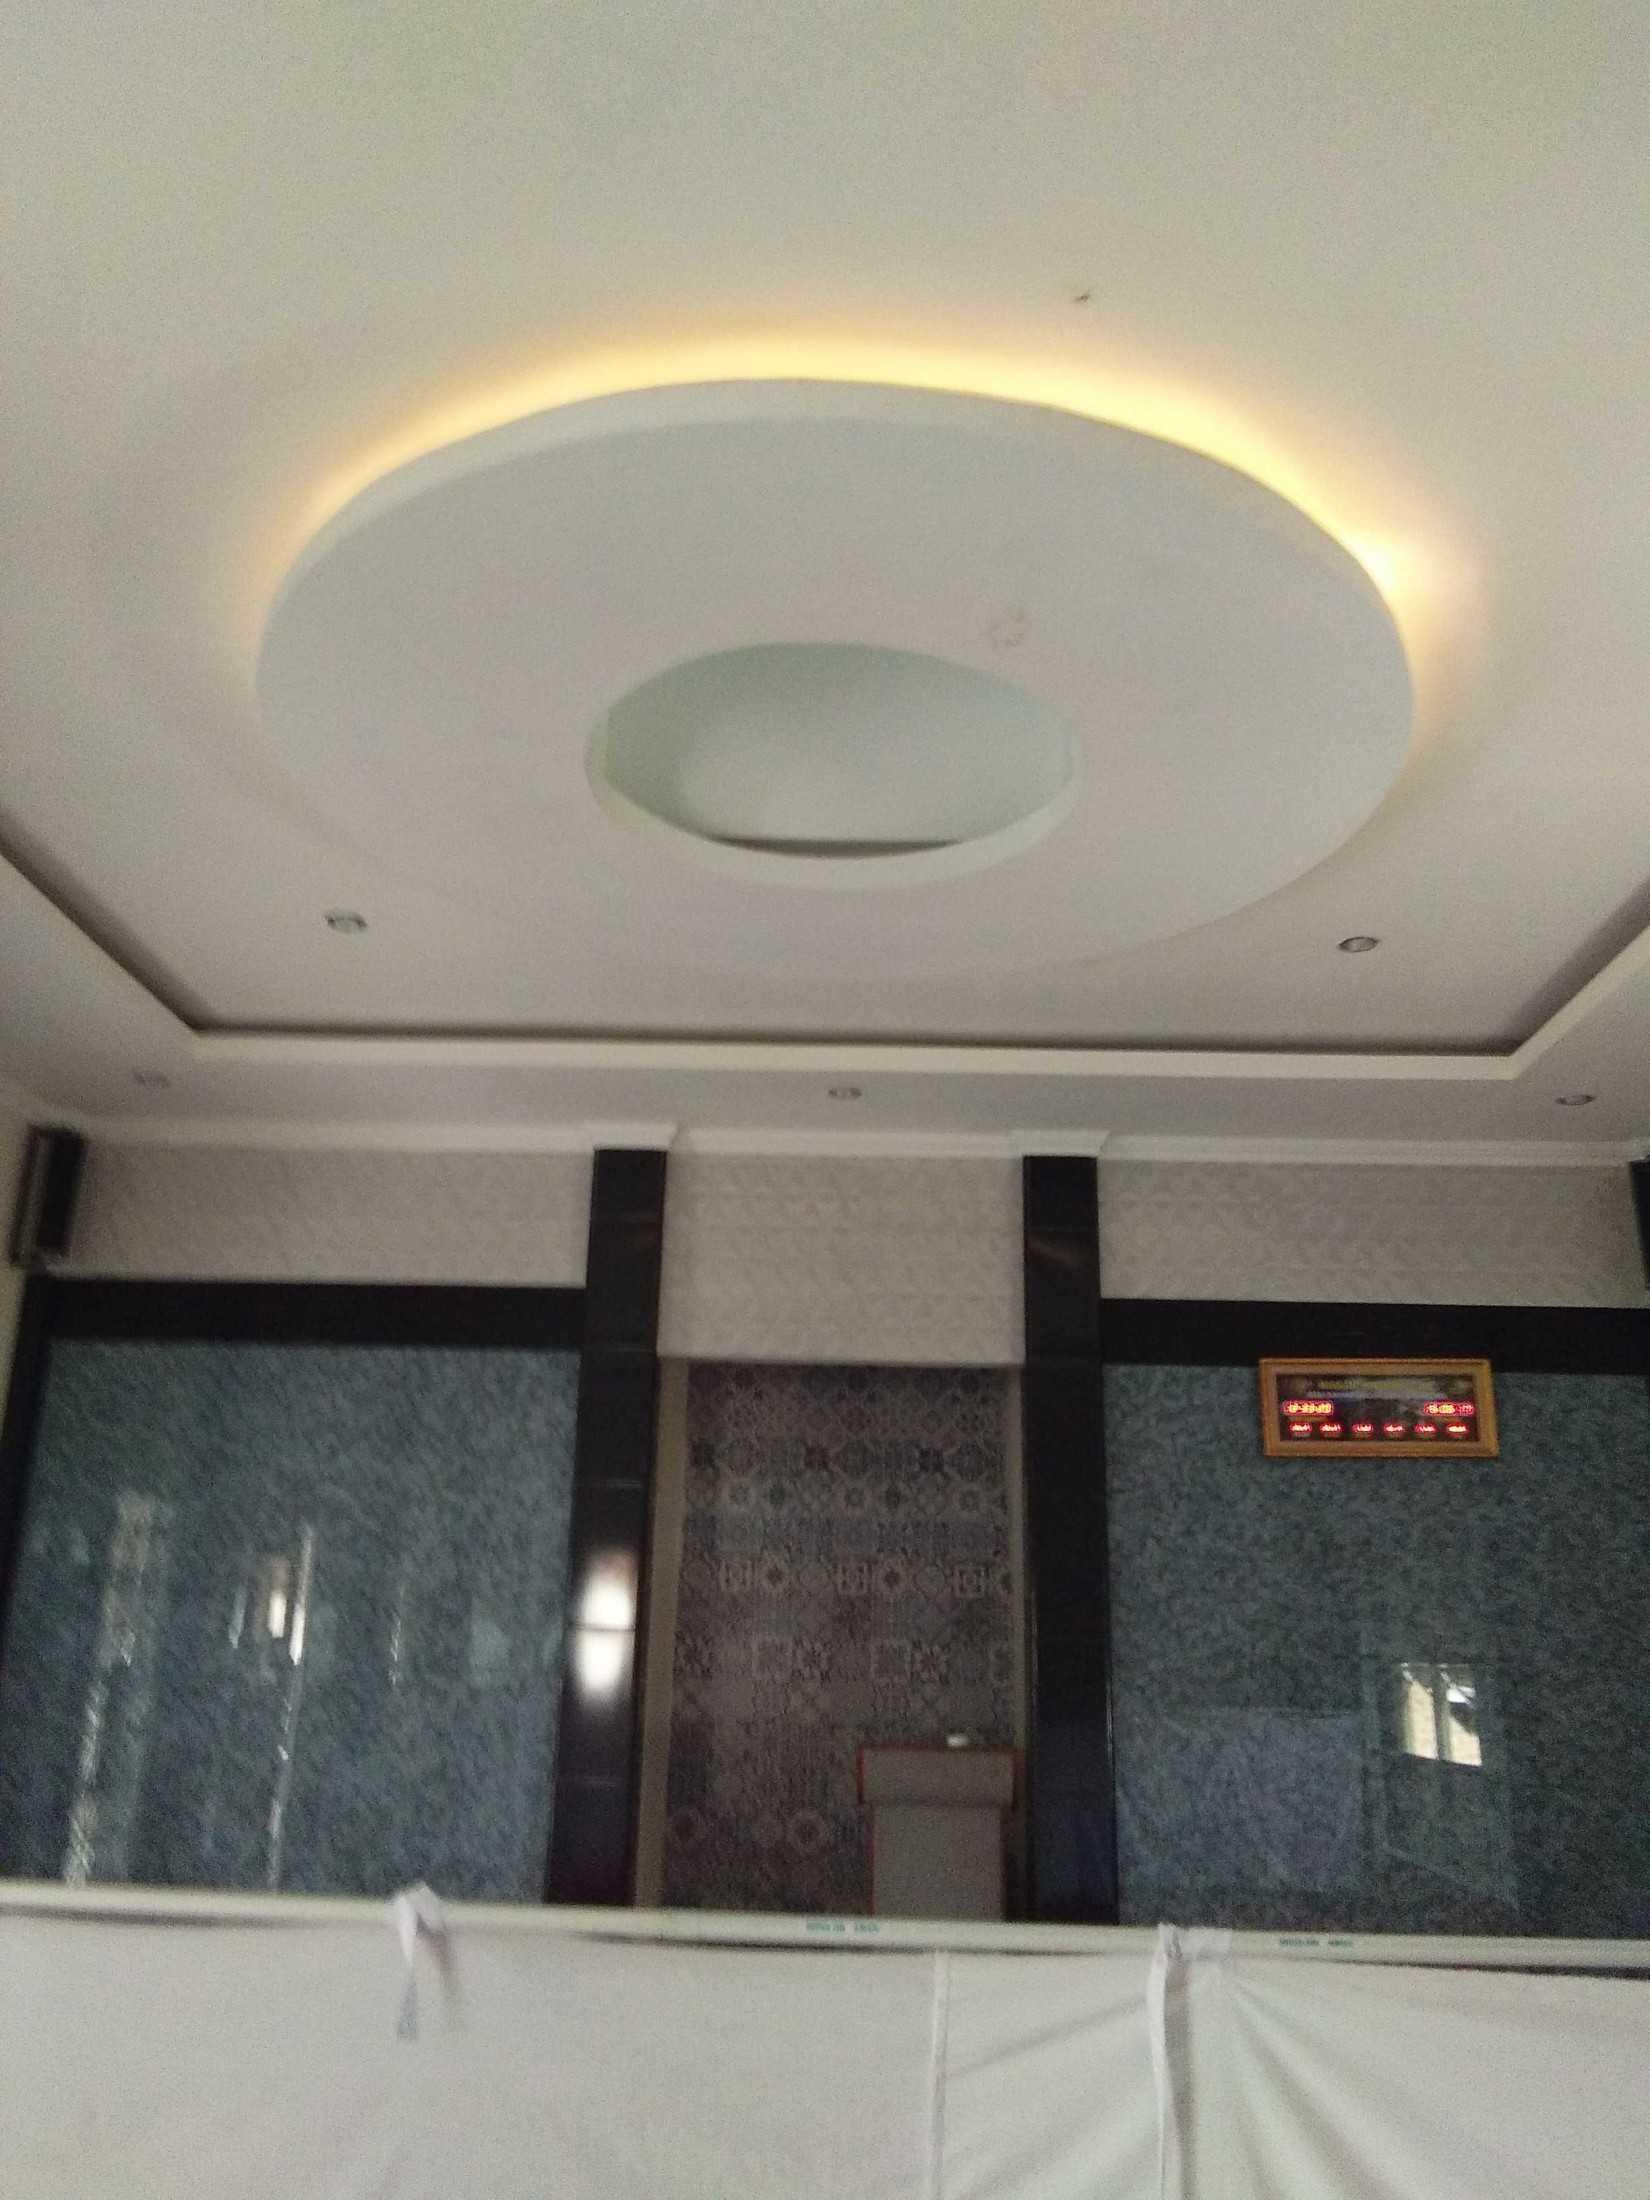 Archdesignbuild7 Mesjid Nasrullah  Soreang, West Java Soreang, West Java Andiyanto-Purwonost-Mesjid-Nasrullah-  57340